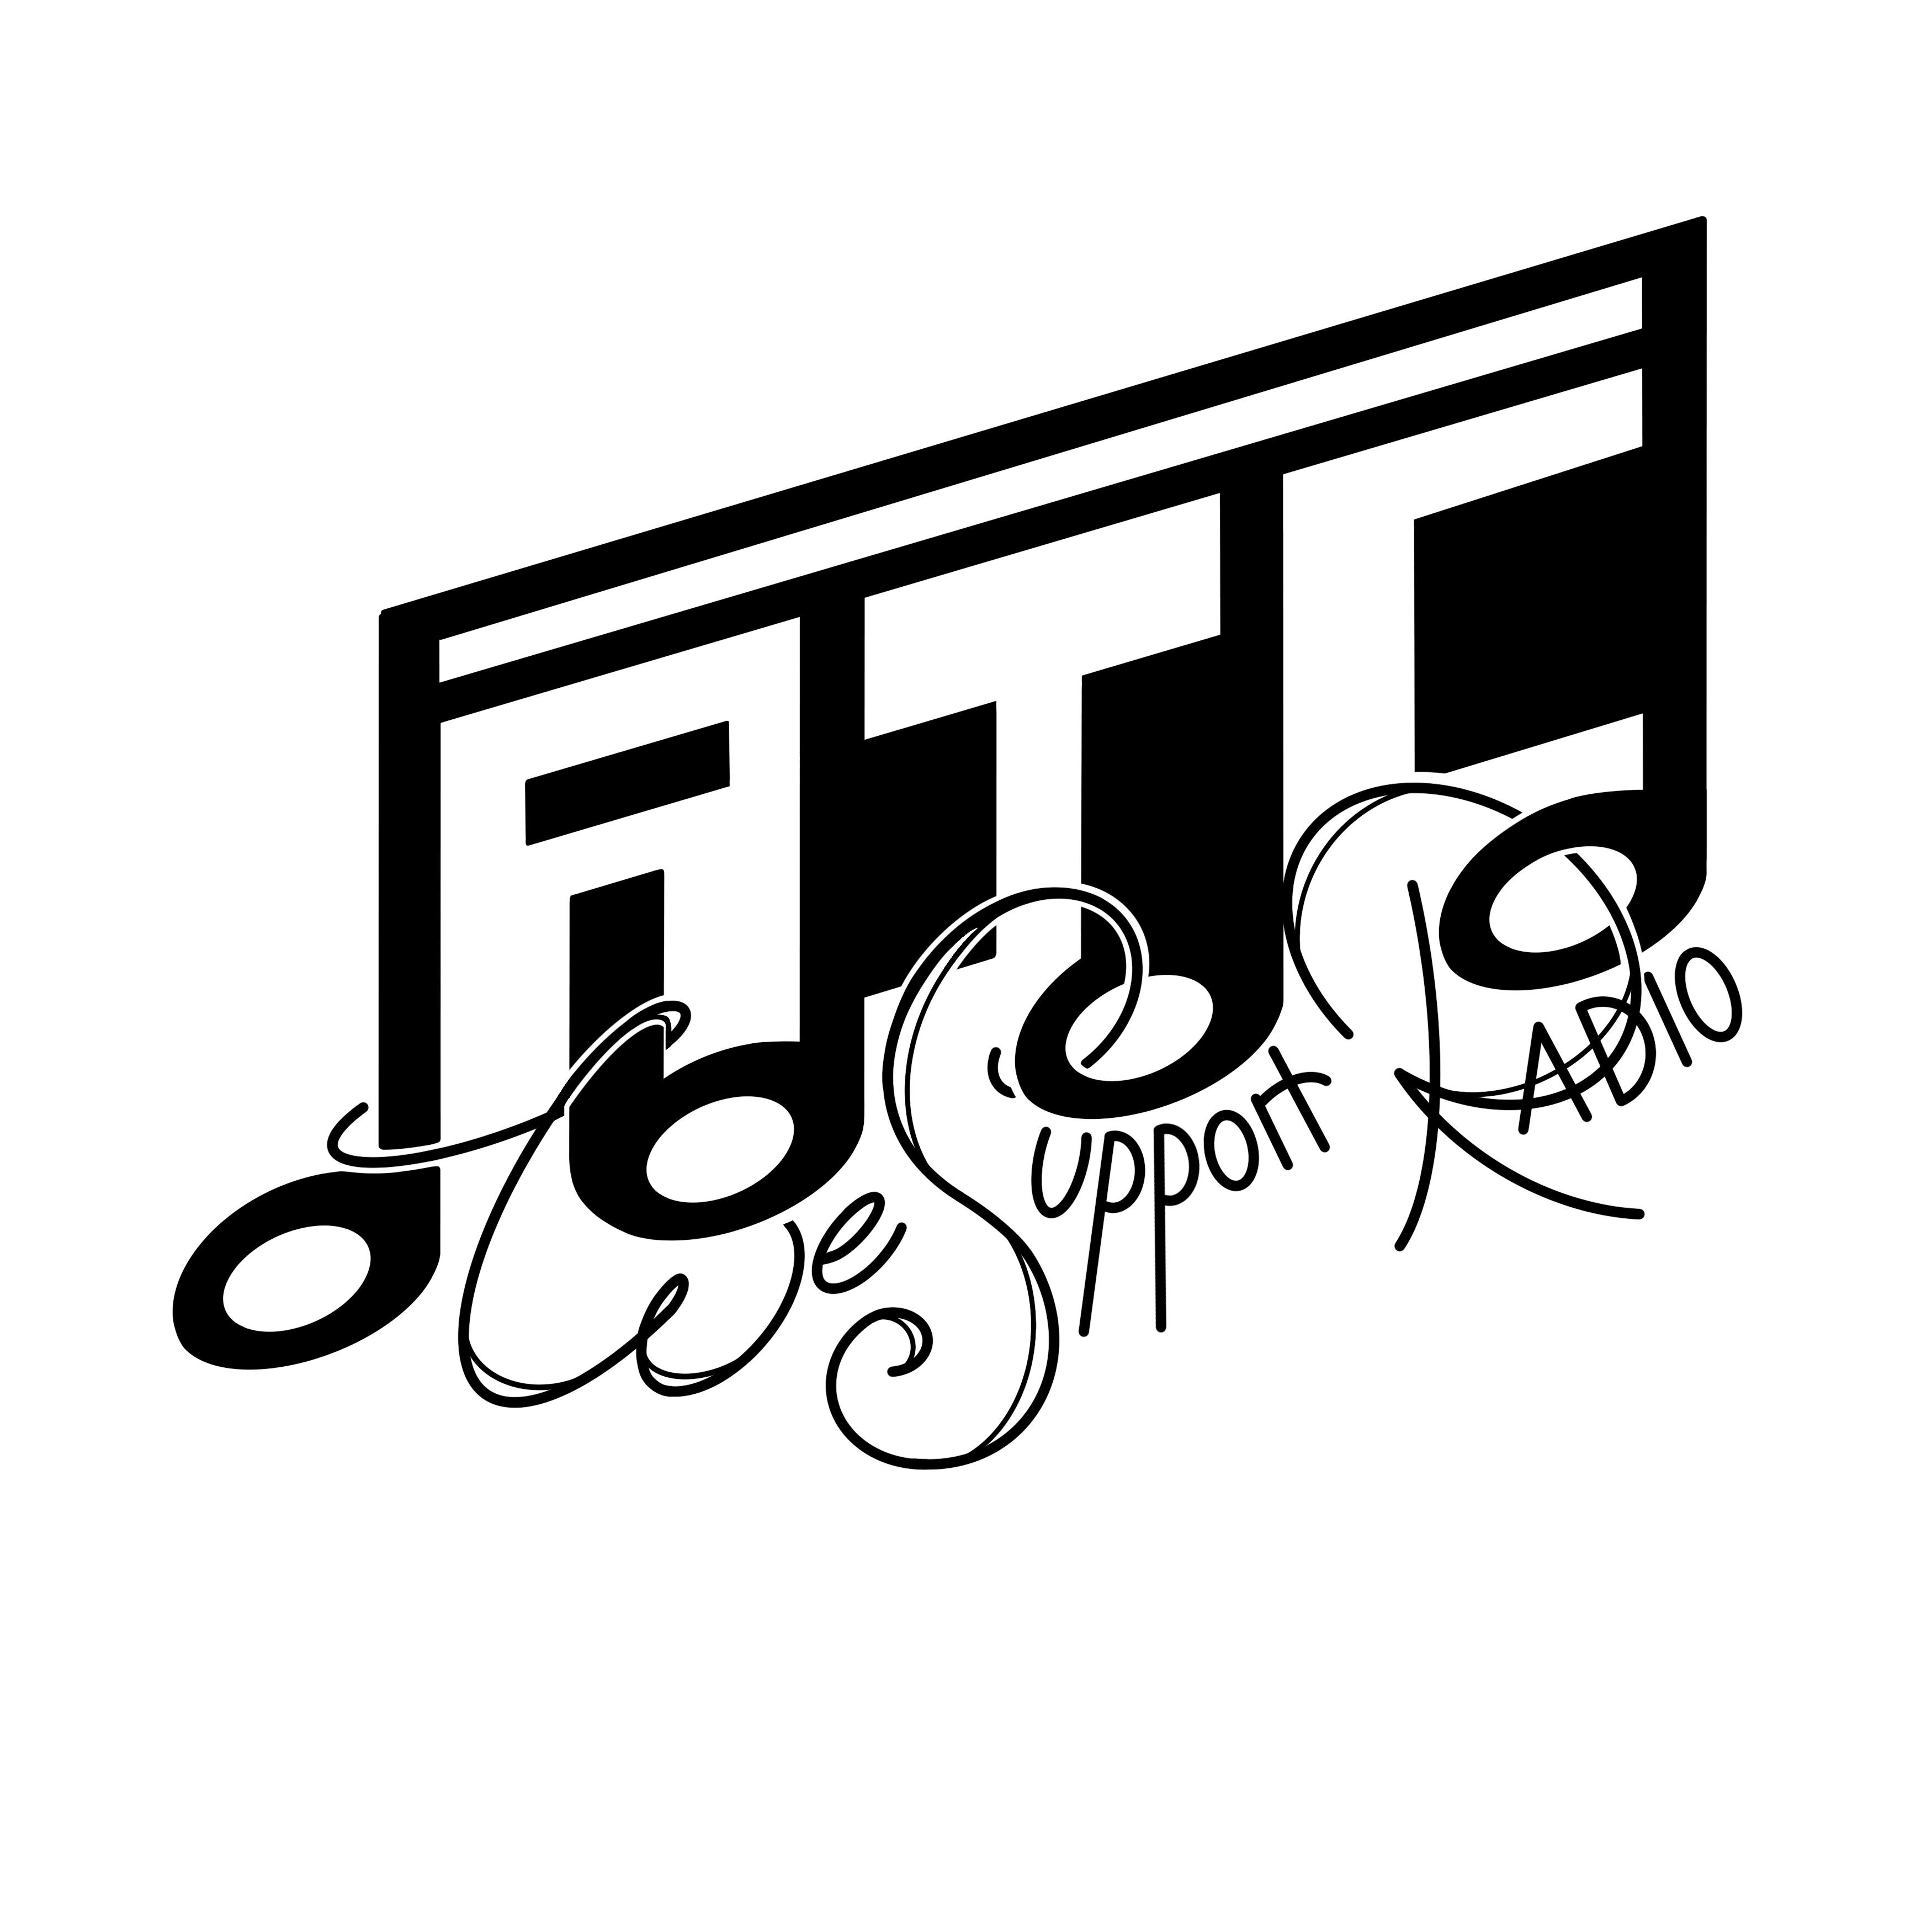 ATC WE SUPPORT RADIO logo